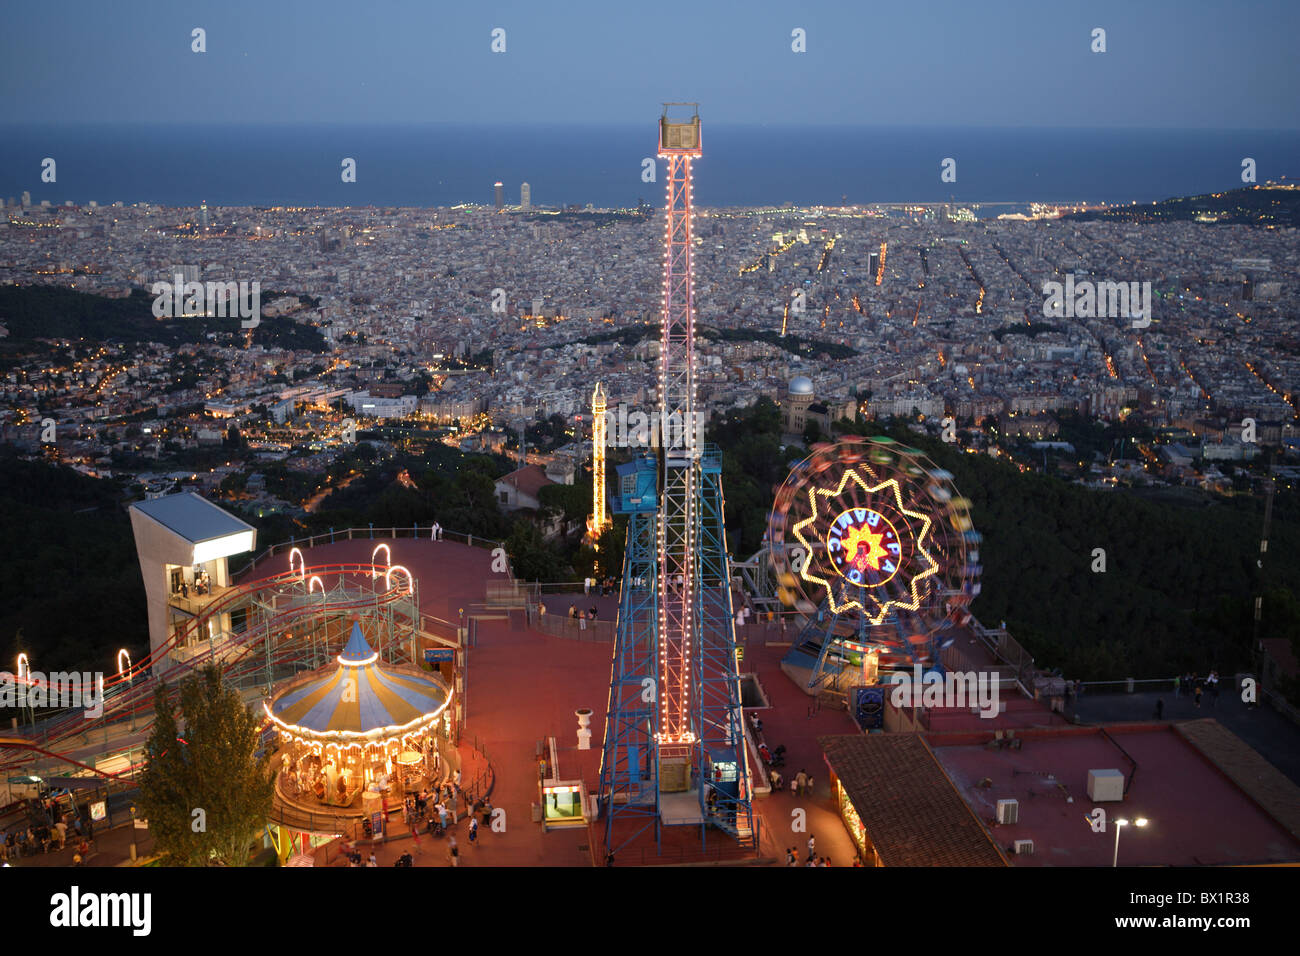 Spain Europe Catalonia Barcelona Tibidabo amusement park fair at Stock Photo,...